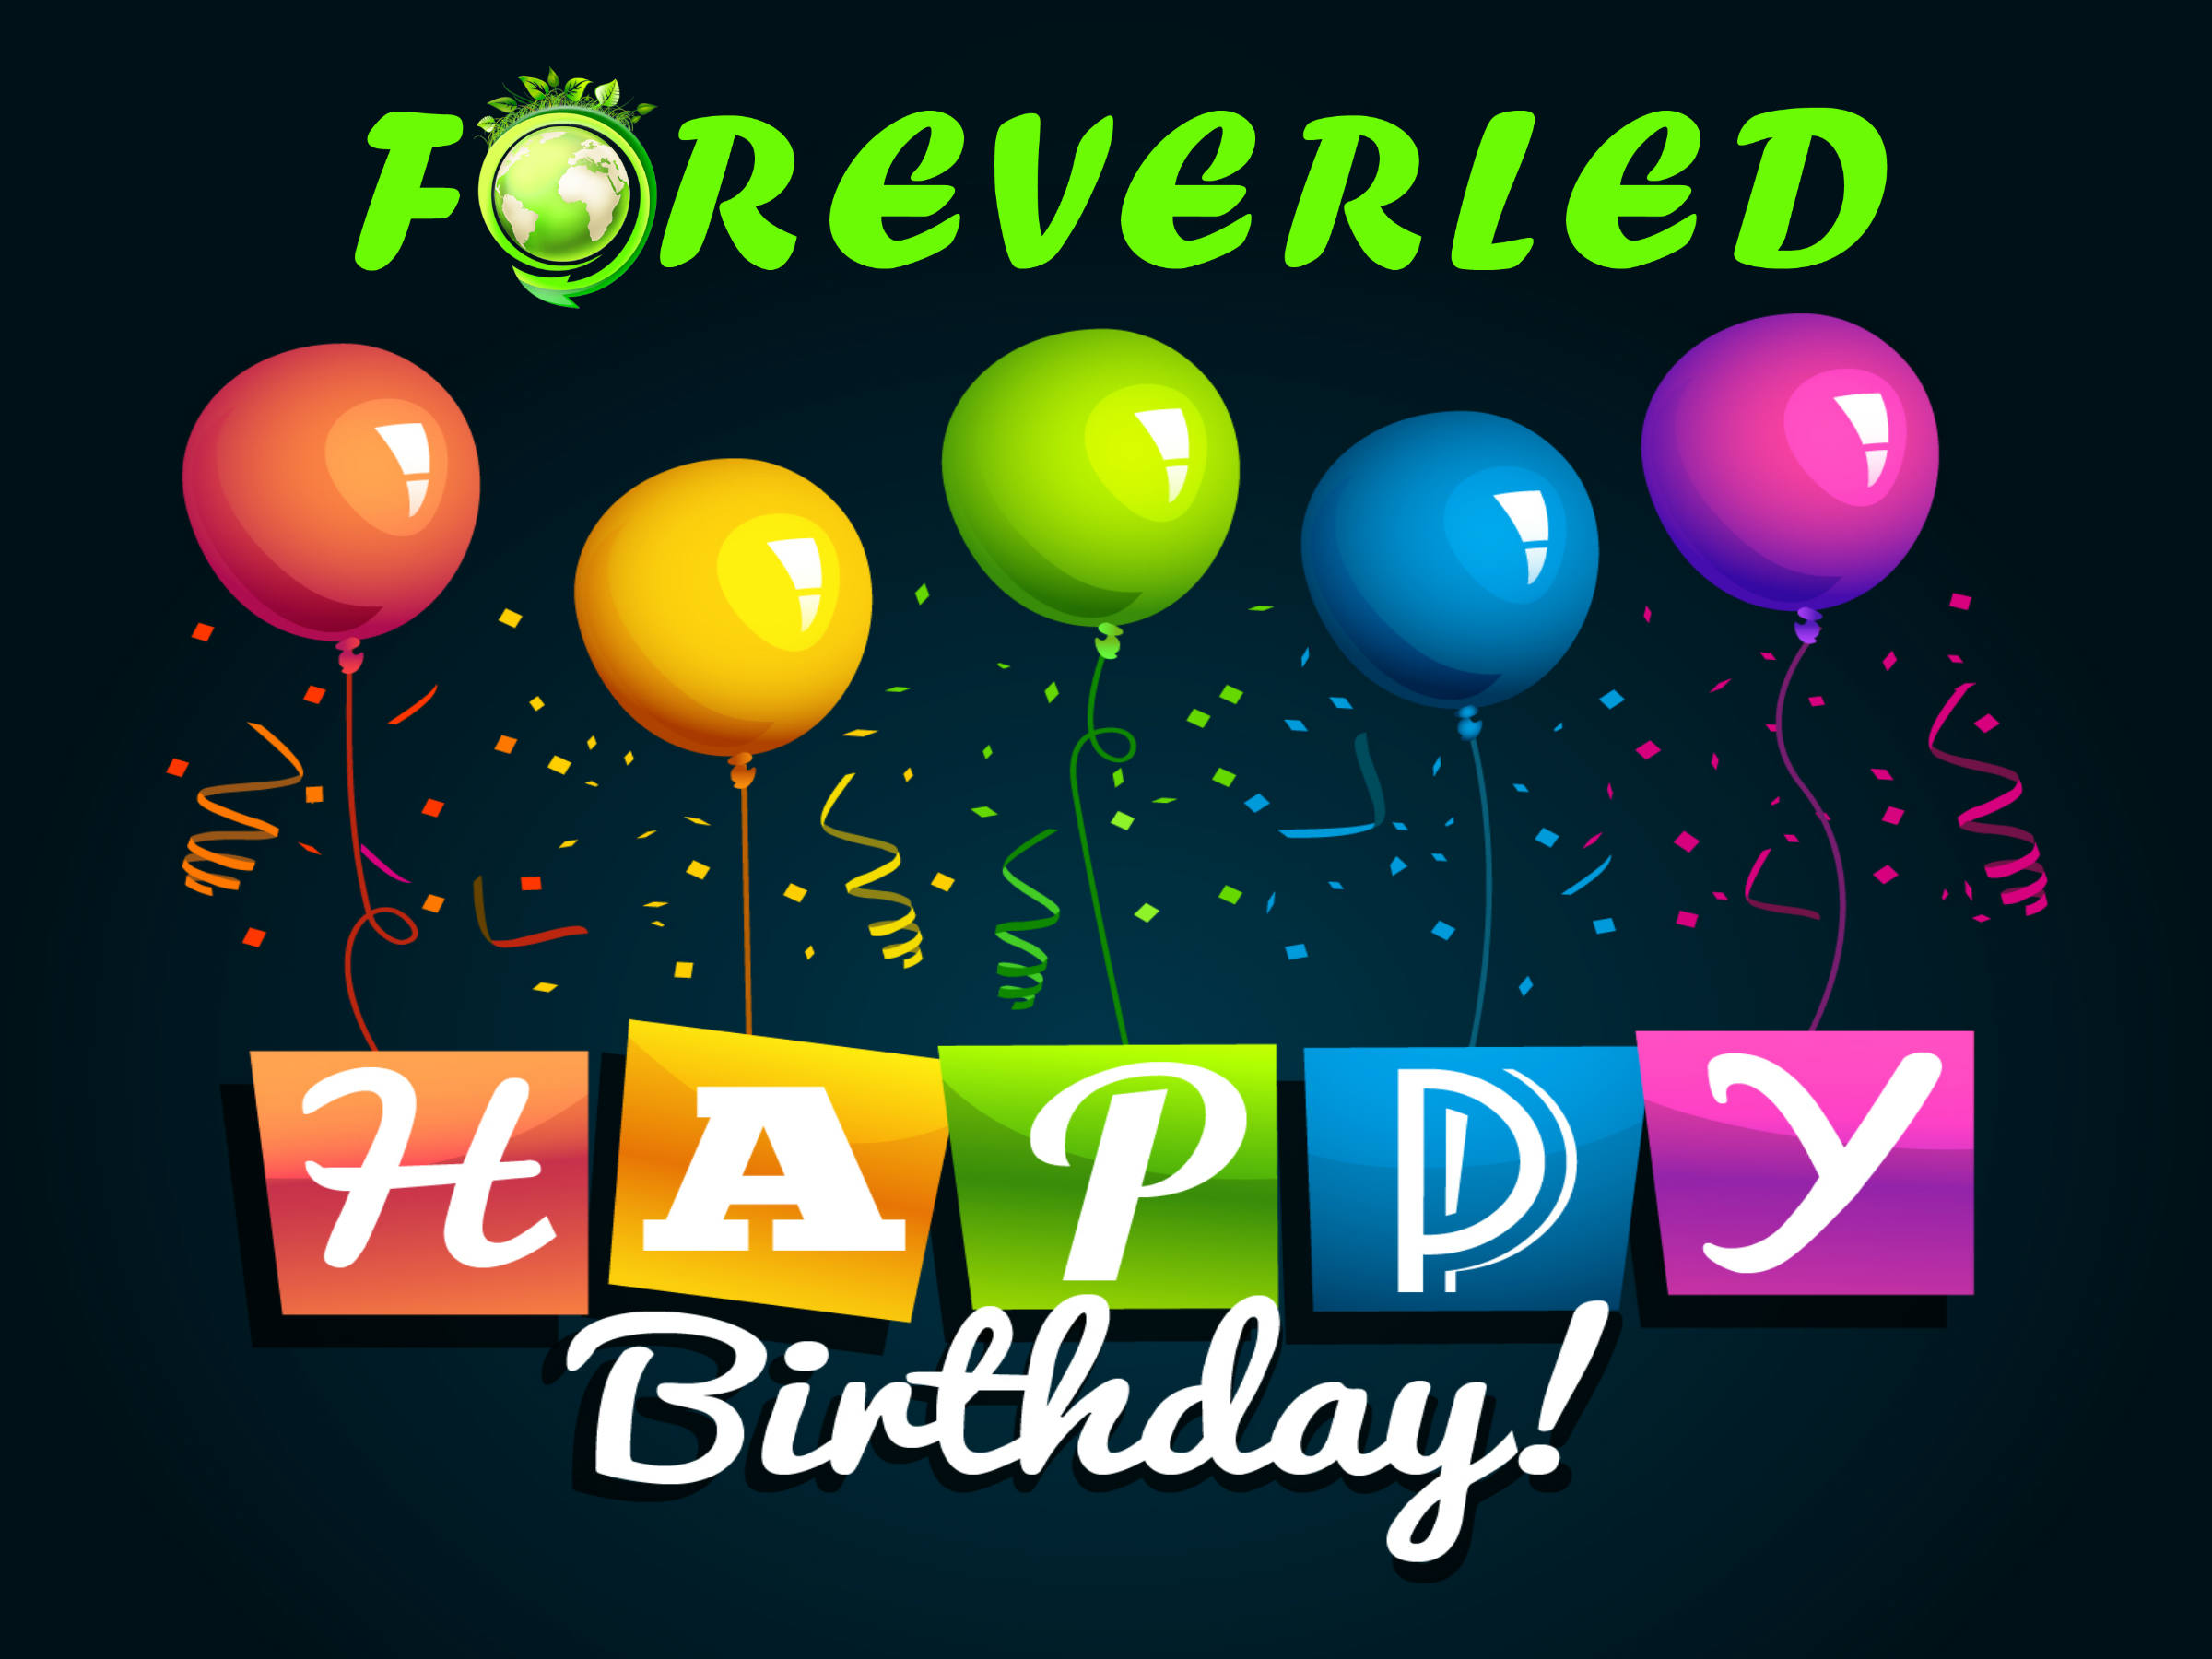 Aniversario ForeverLED